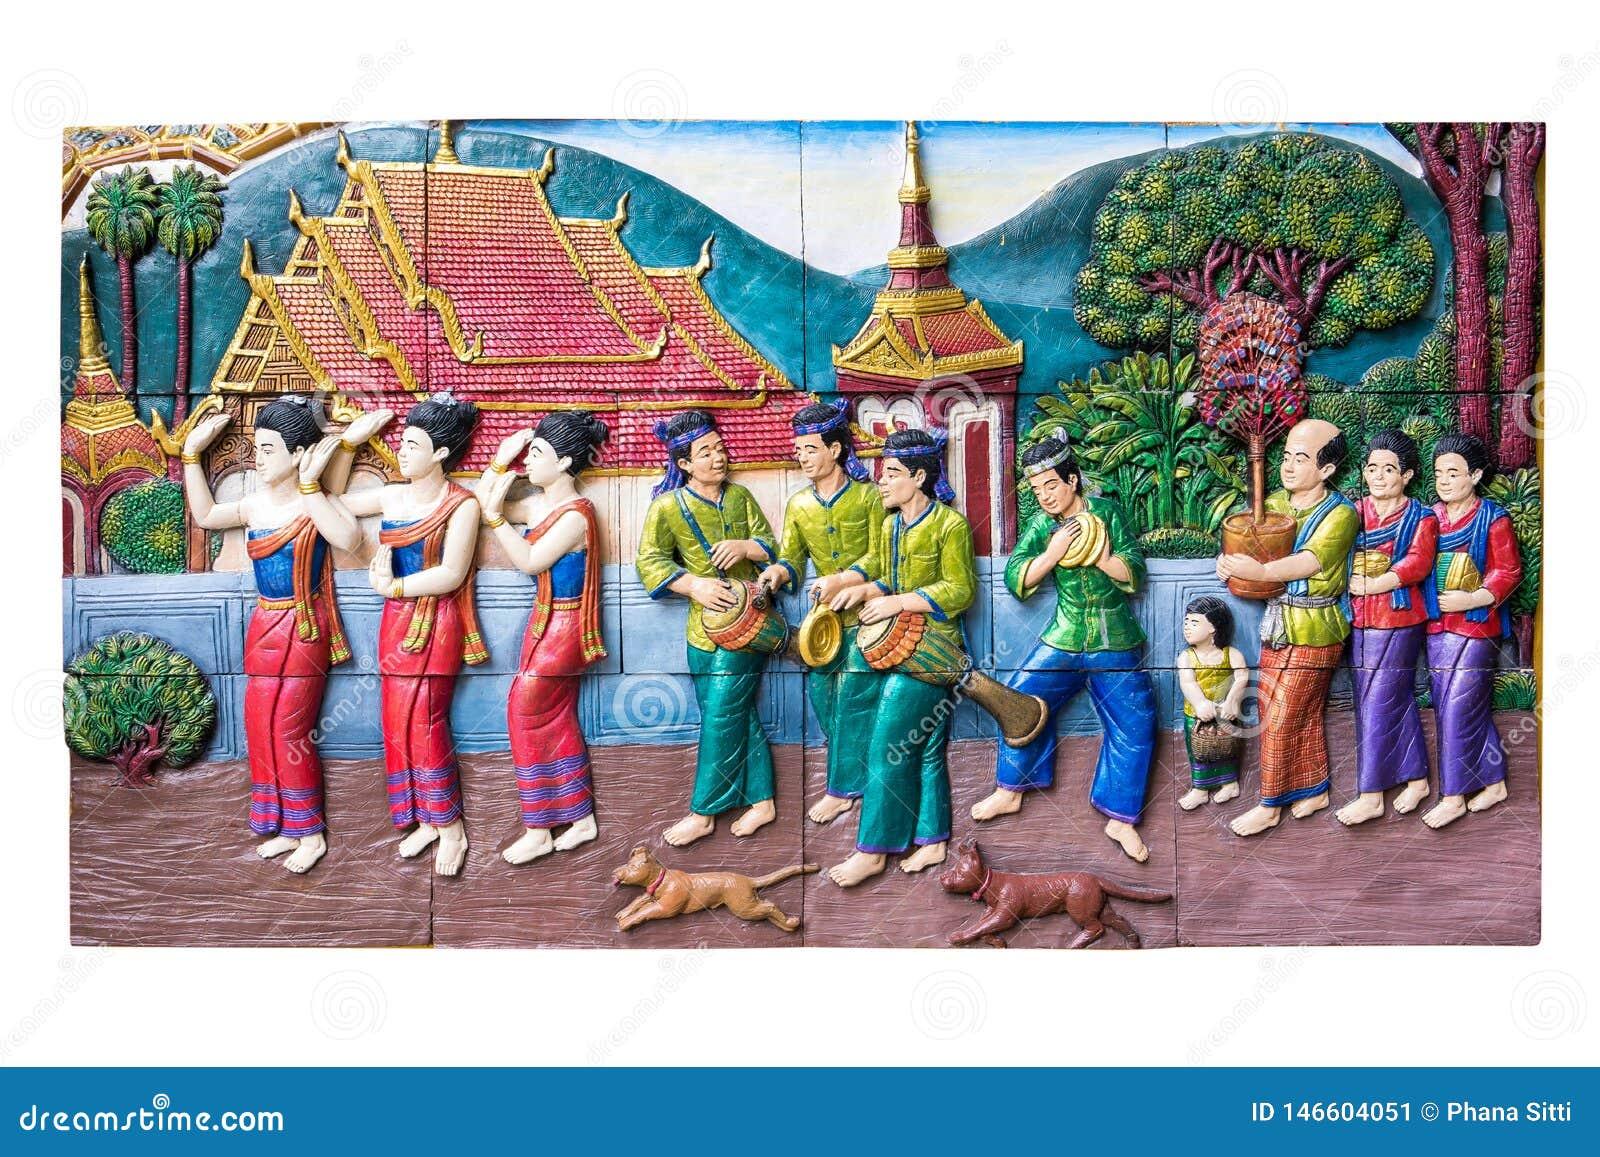 CHIANGMAI, ΤΑΪΛΑΝΔΗ - 9 ΣΕΠΤΕΜΒΡΊΟΥ 2016: Πέτρινη γλυπτική της παραδοσιακής ταϊλανδικής αγροτικής ζωής πολιτισμού στο παρελθόν στ